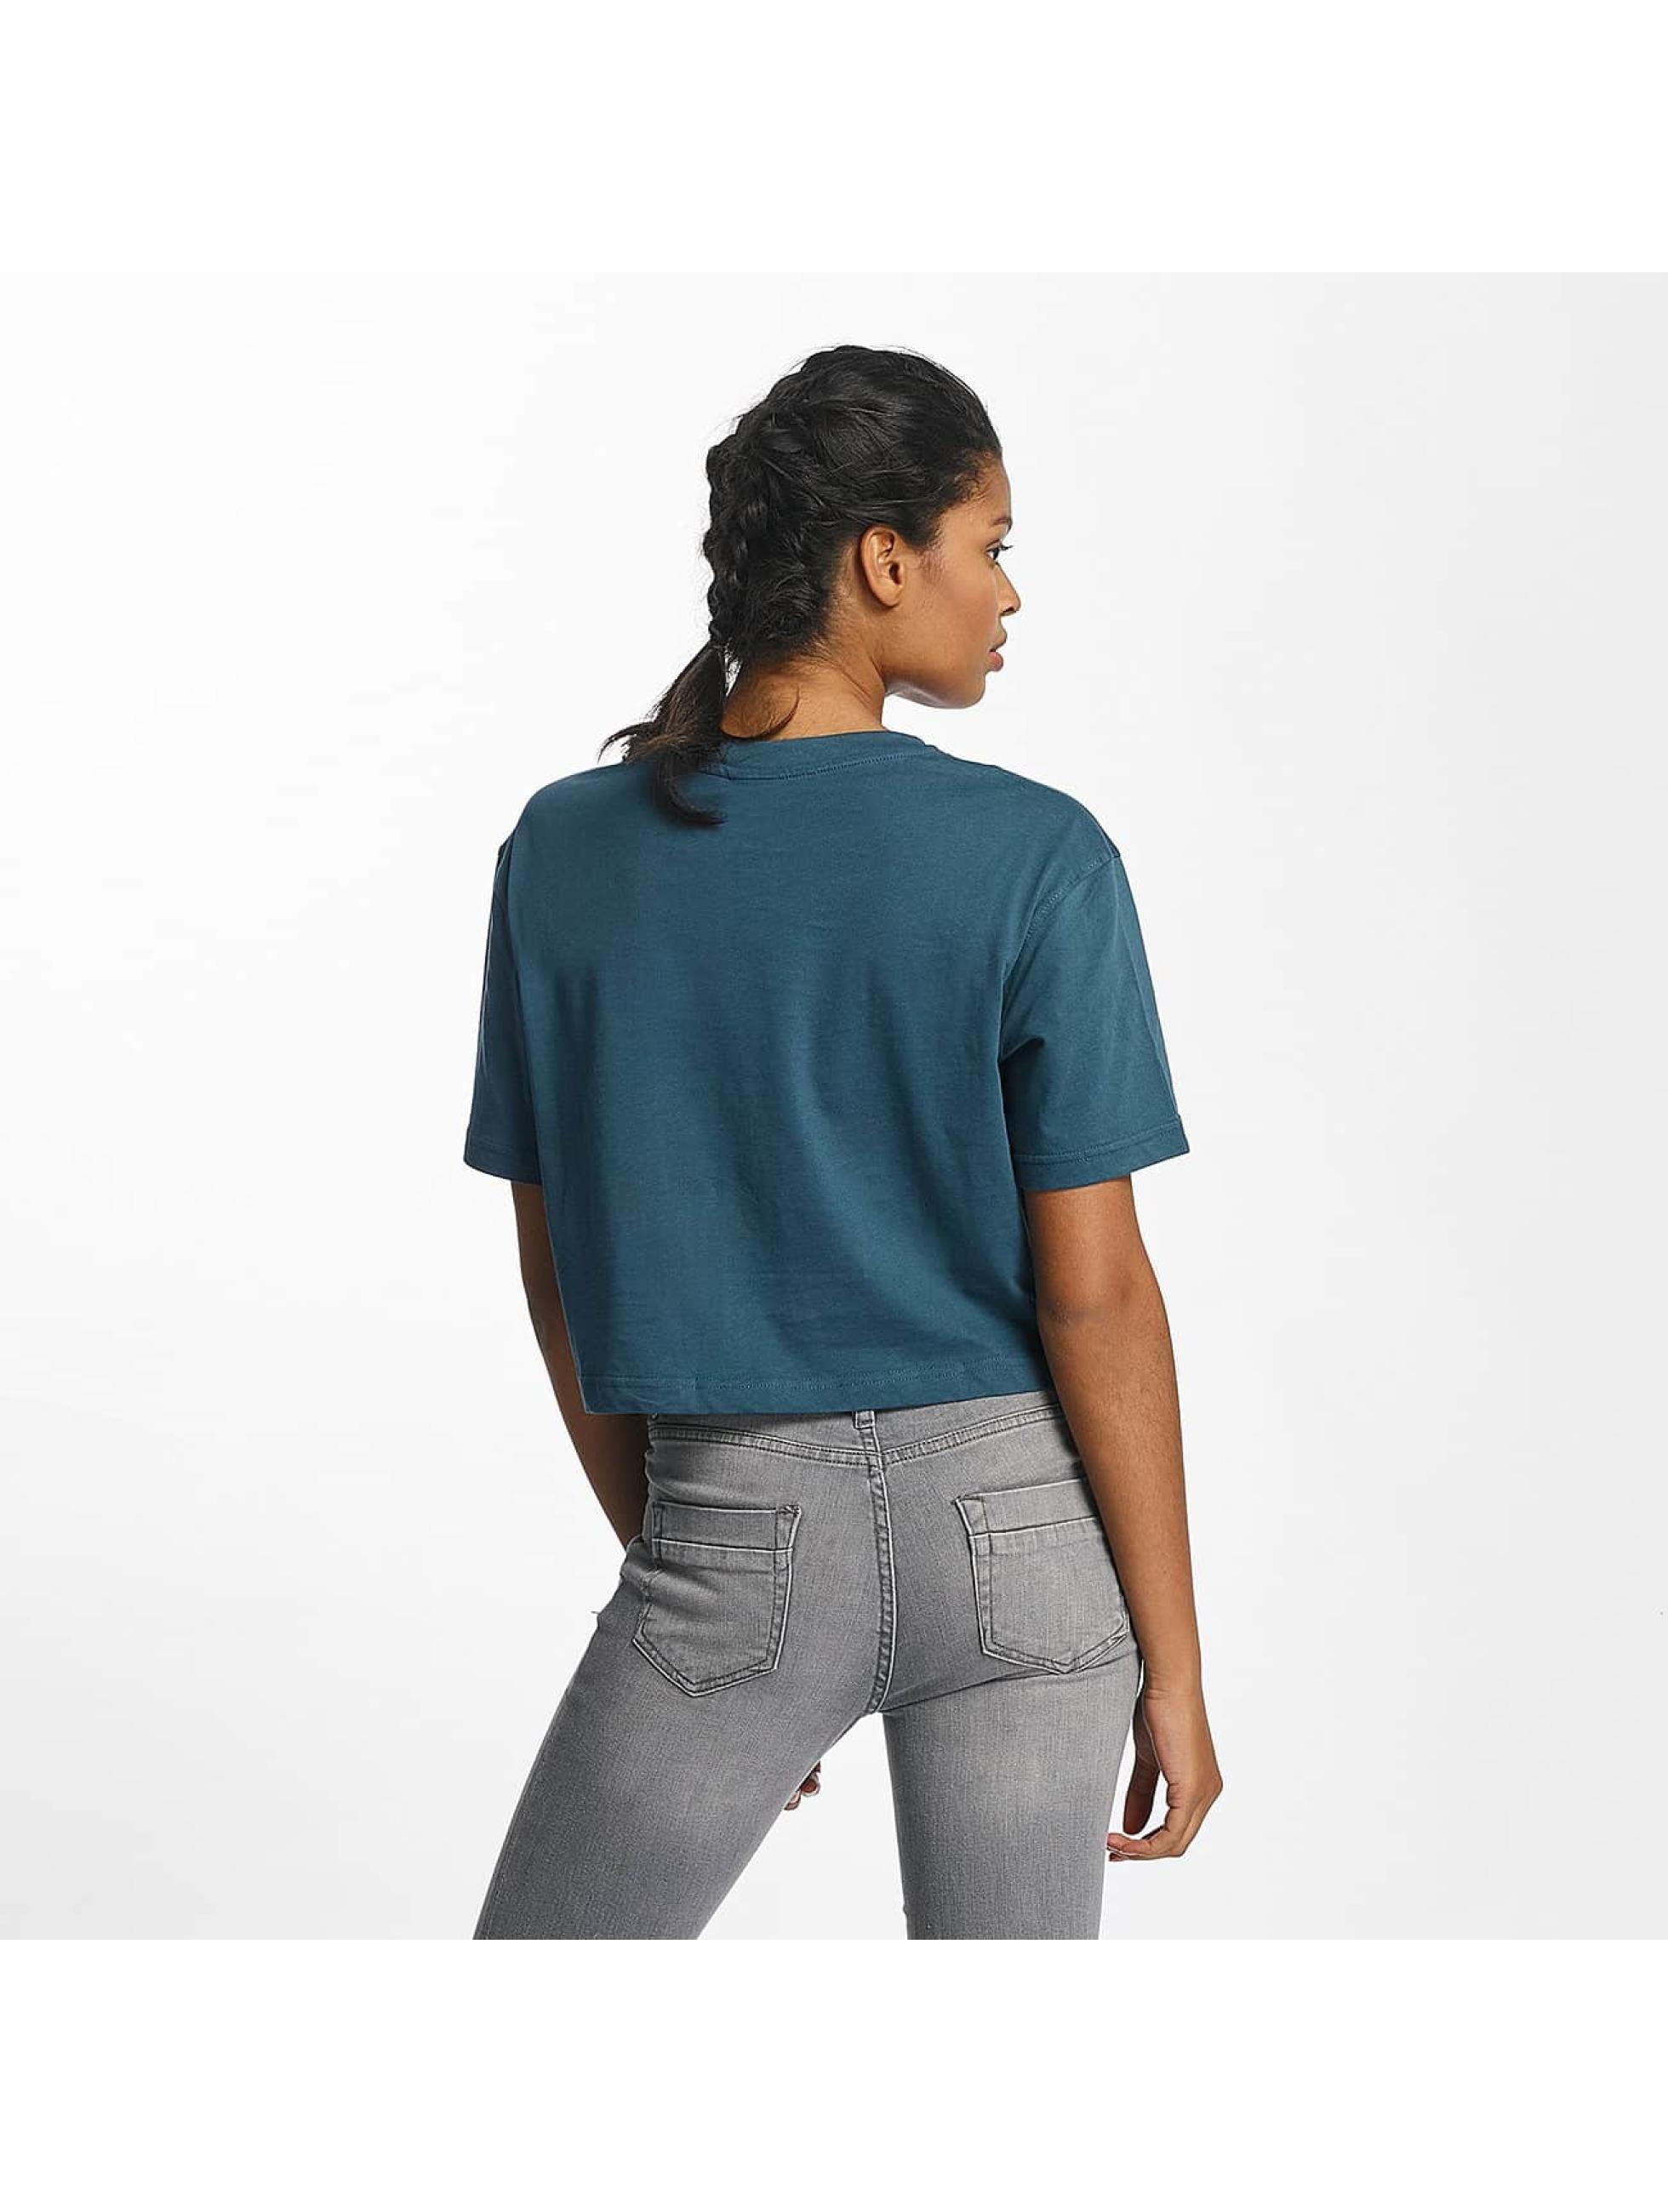 Urban Classics T-shirt Ladies Oversized turchese